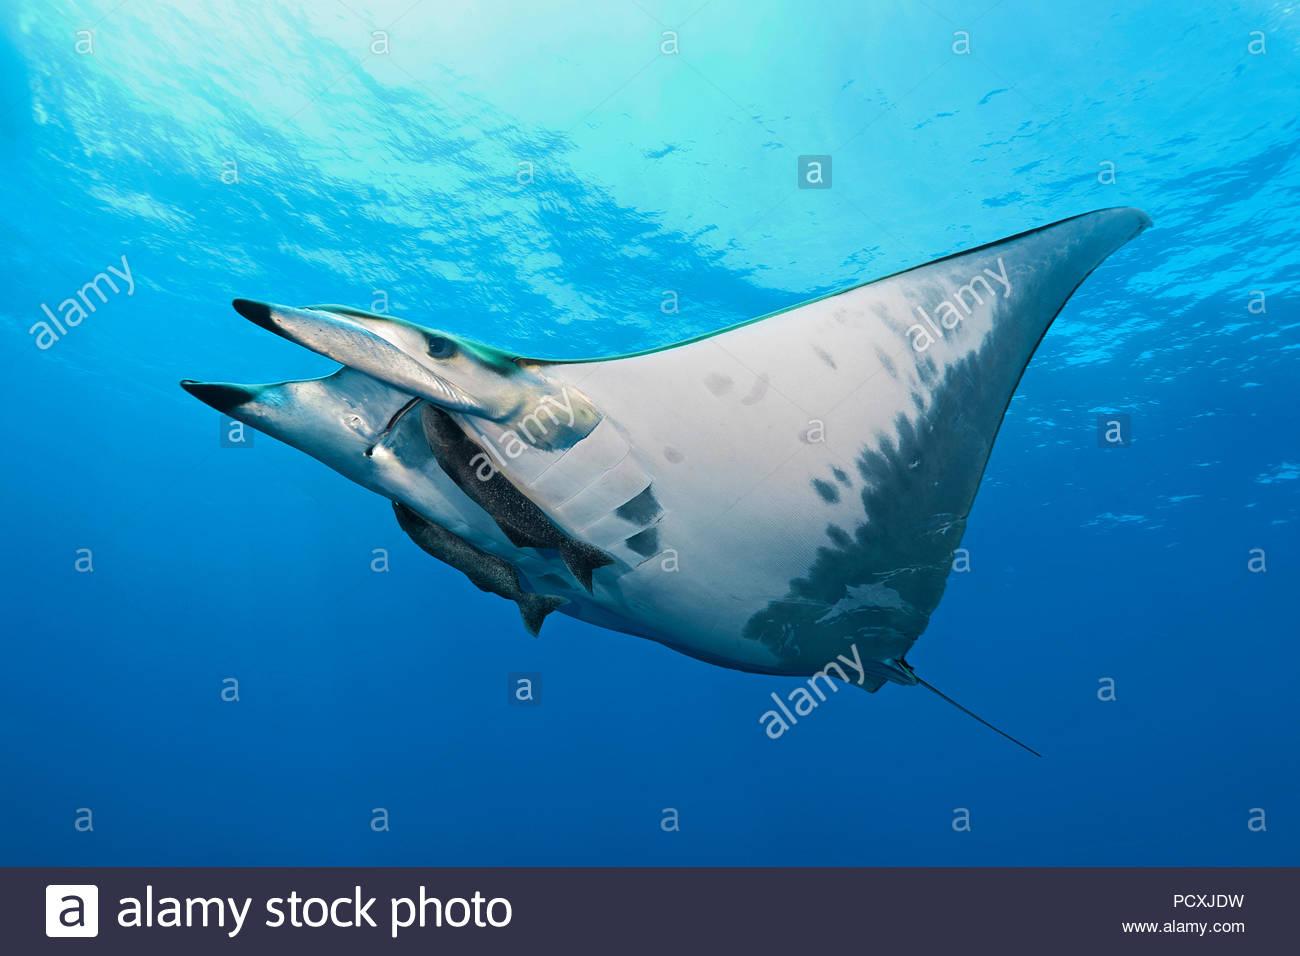 Spiny mobula or Chilean devil ray (Mobula tarapacana) with remora (Echeneidae), Santa Maria island, Azores, Portugal - Stock Image